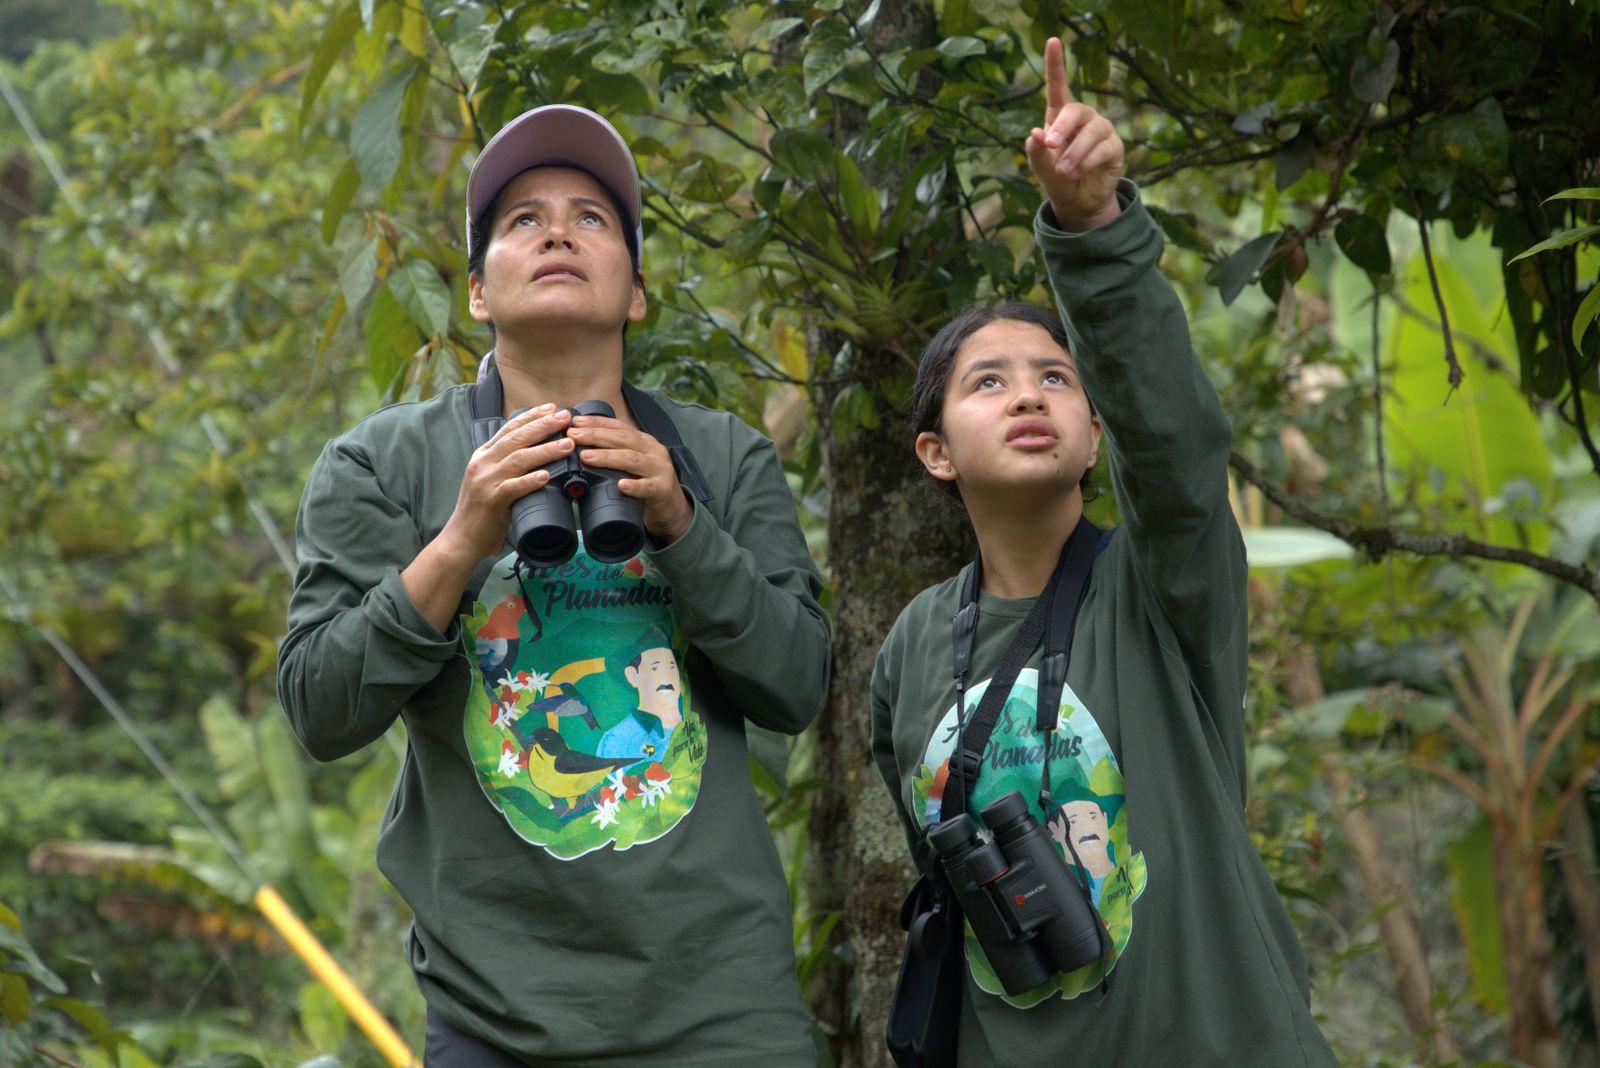 Aceneth Bedoya (links) mit ihrer Tochter Dayanna_Planadas_Credits_Marcos de la Oz-1